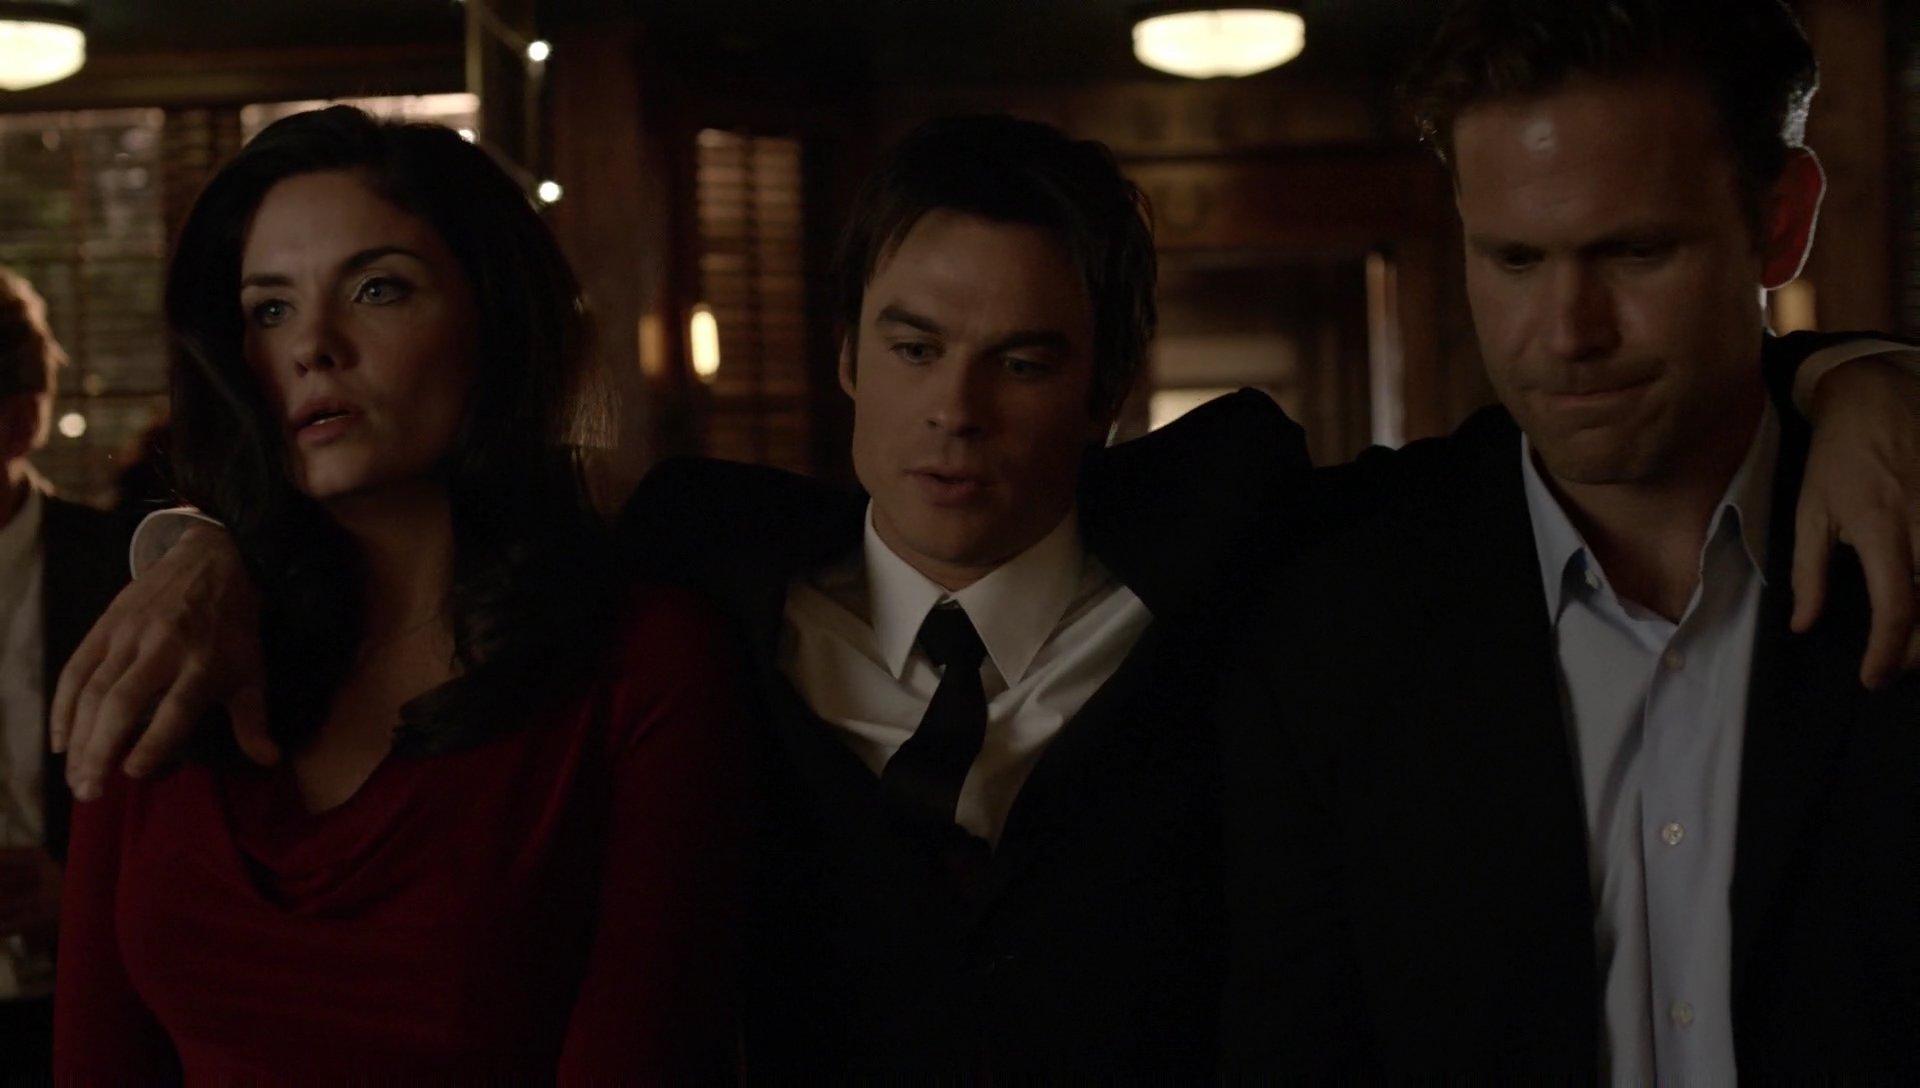 The Vampire Diaries 6x07 Recap: Do you remember the